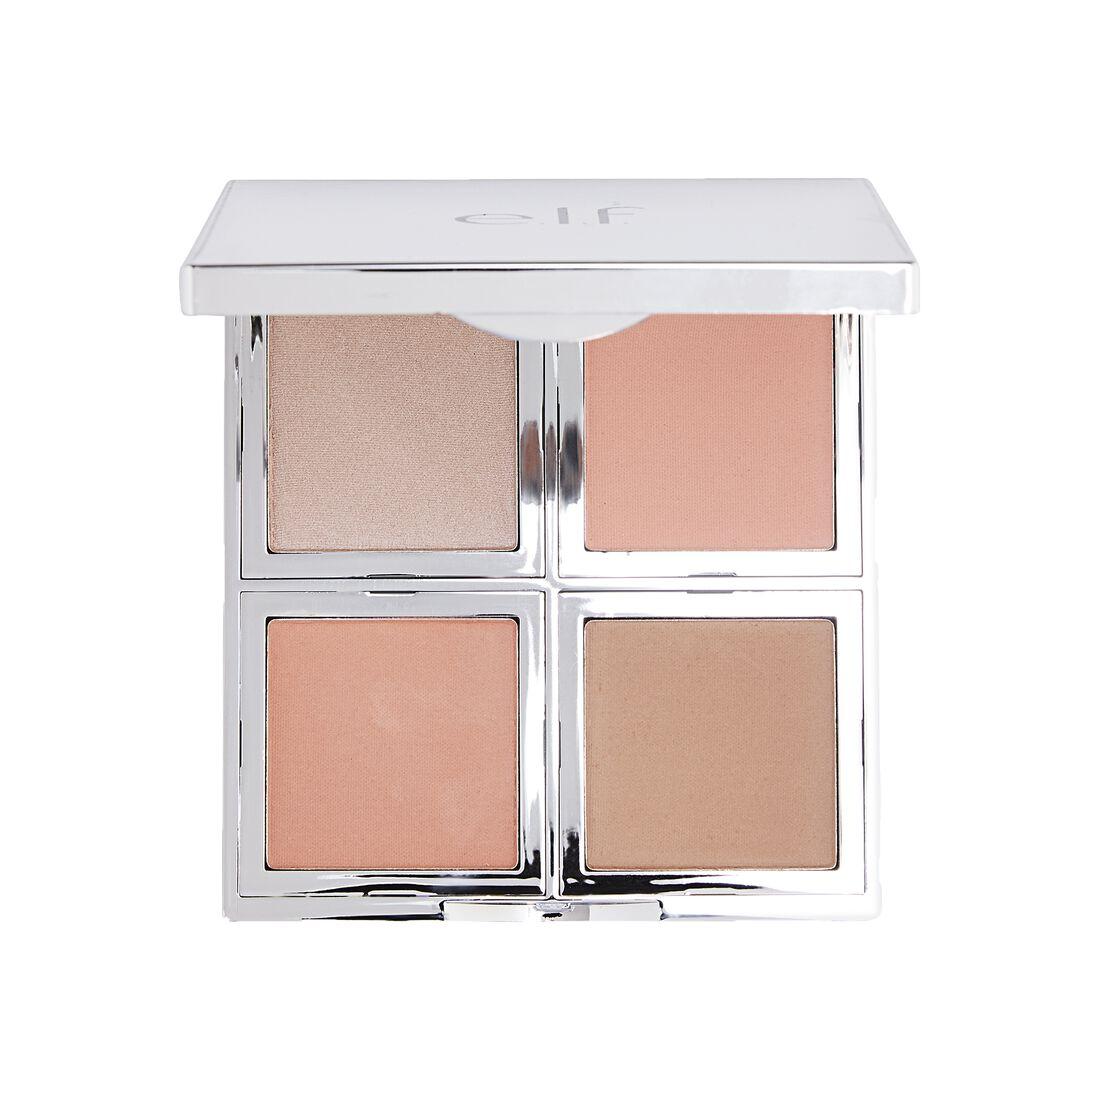 E.l.f Cosmetics - Beautifully Bare Natural Glow Face Palette